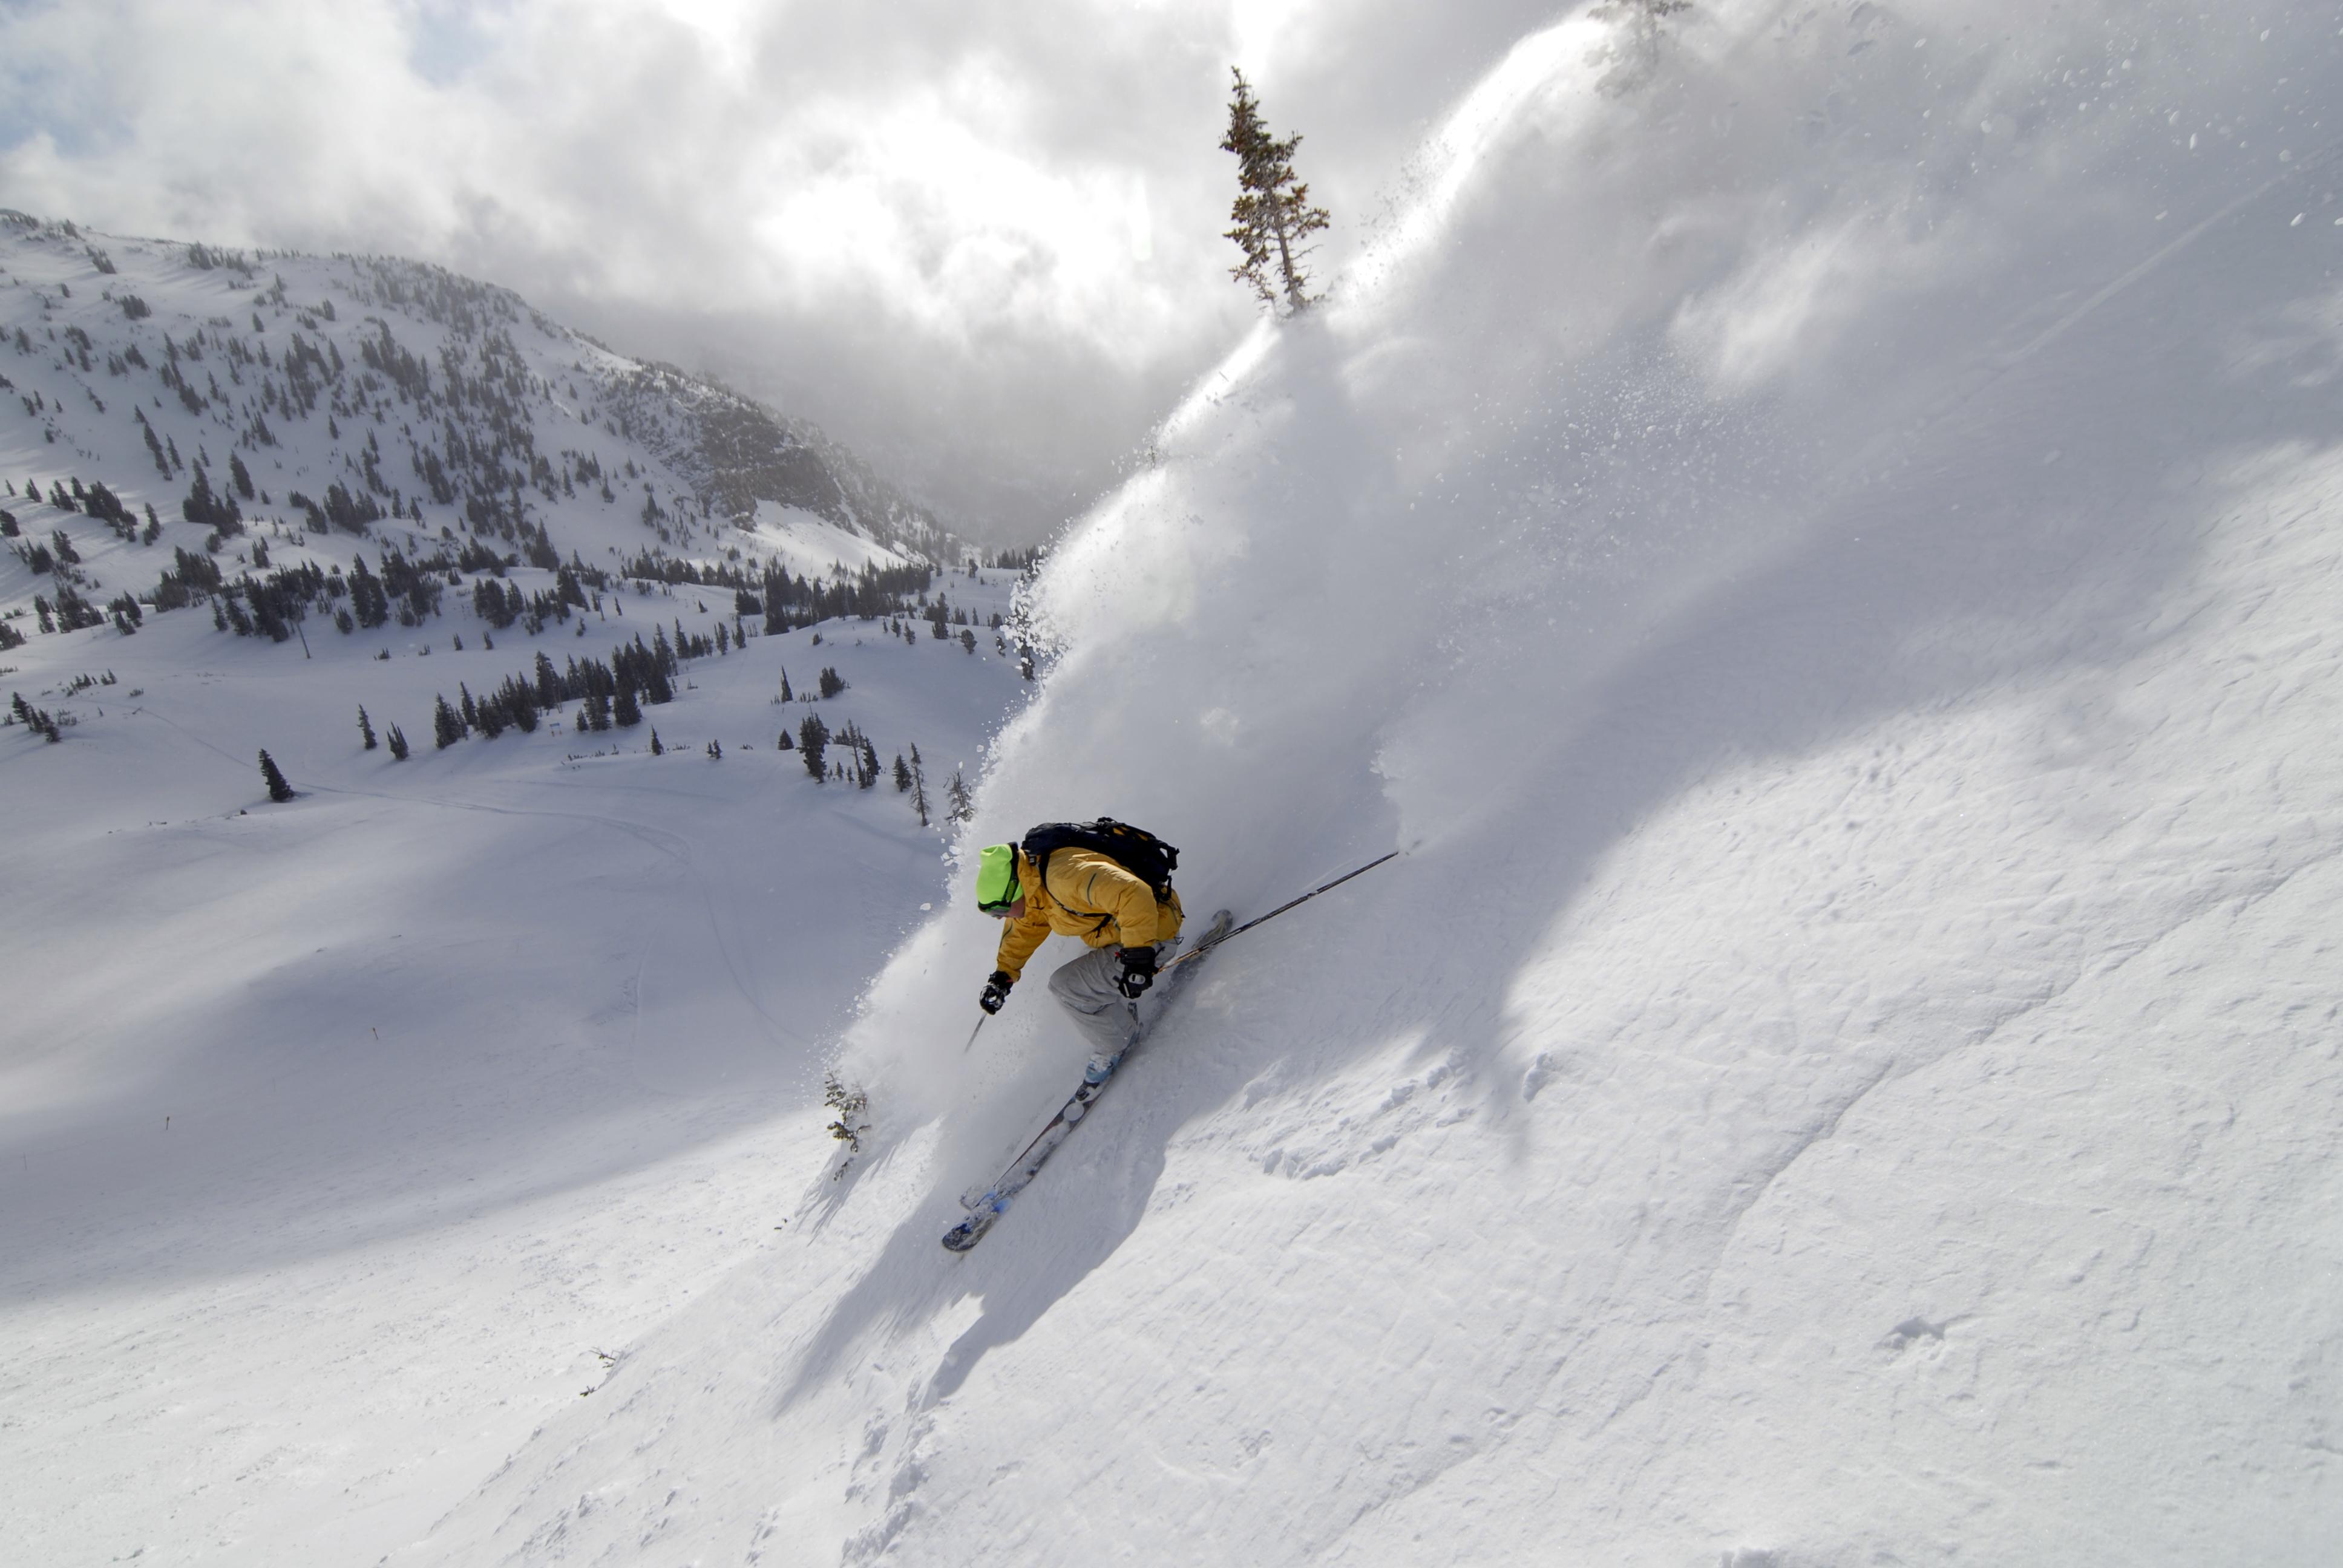 beeab1ba3ca45 Things to Do at Snowbird Ski Resort